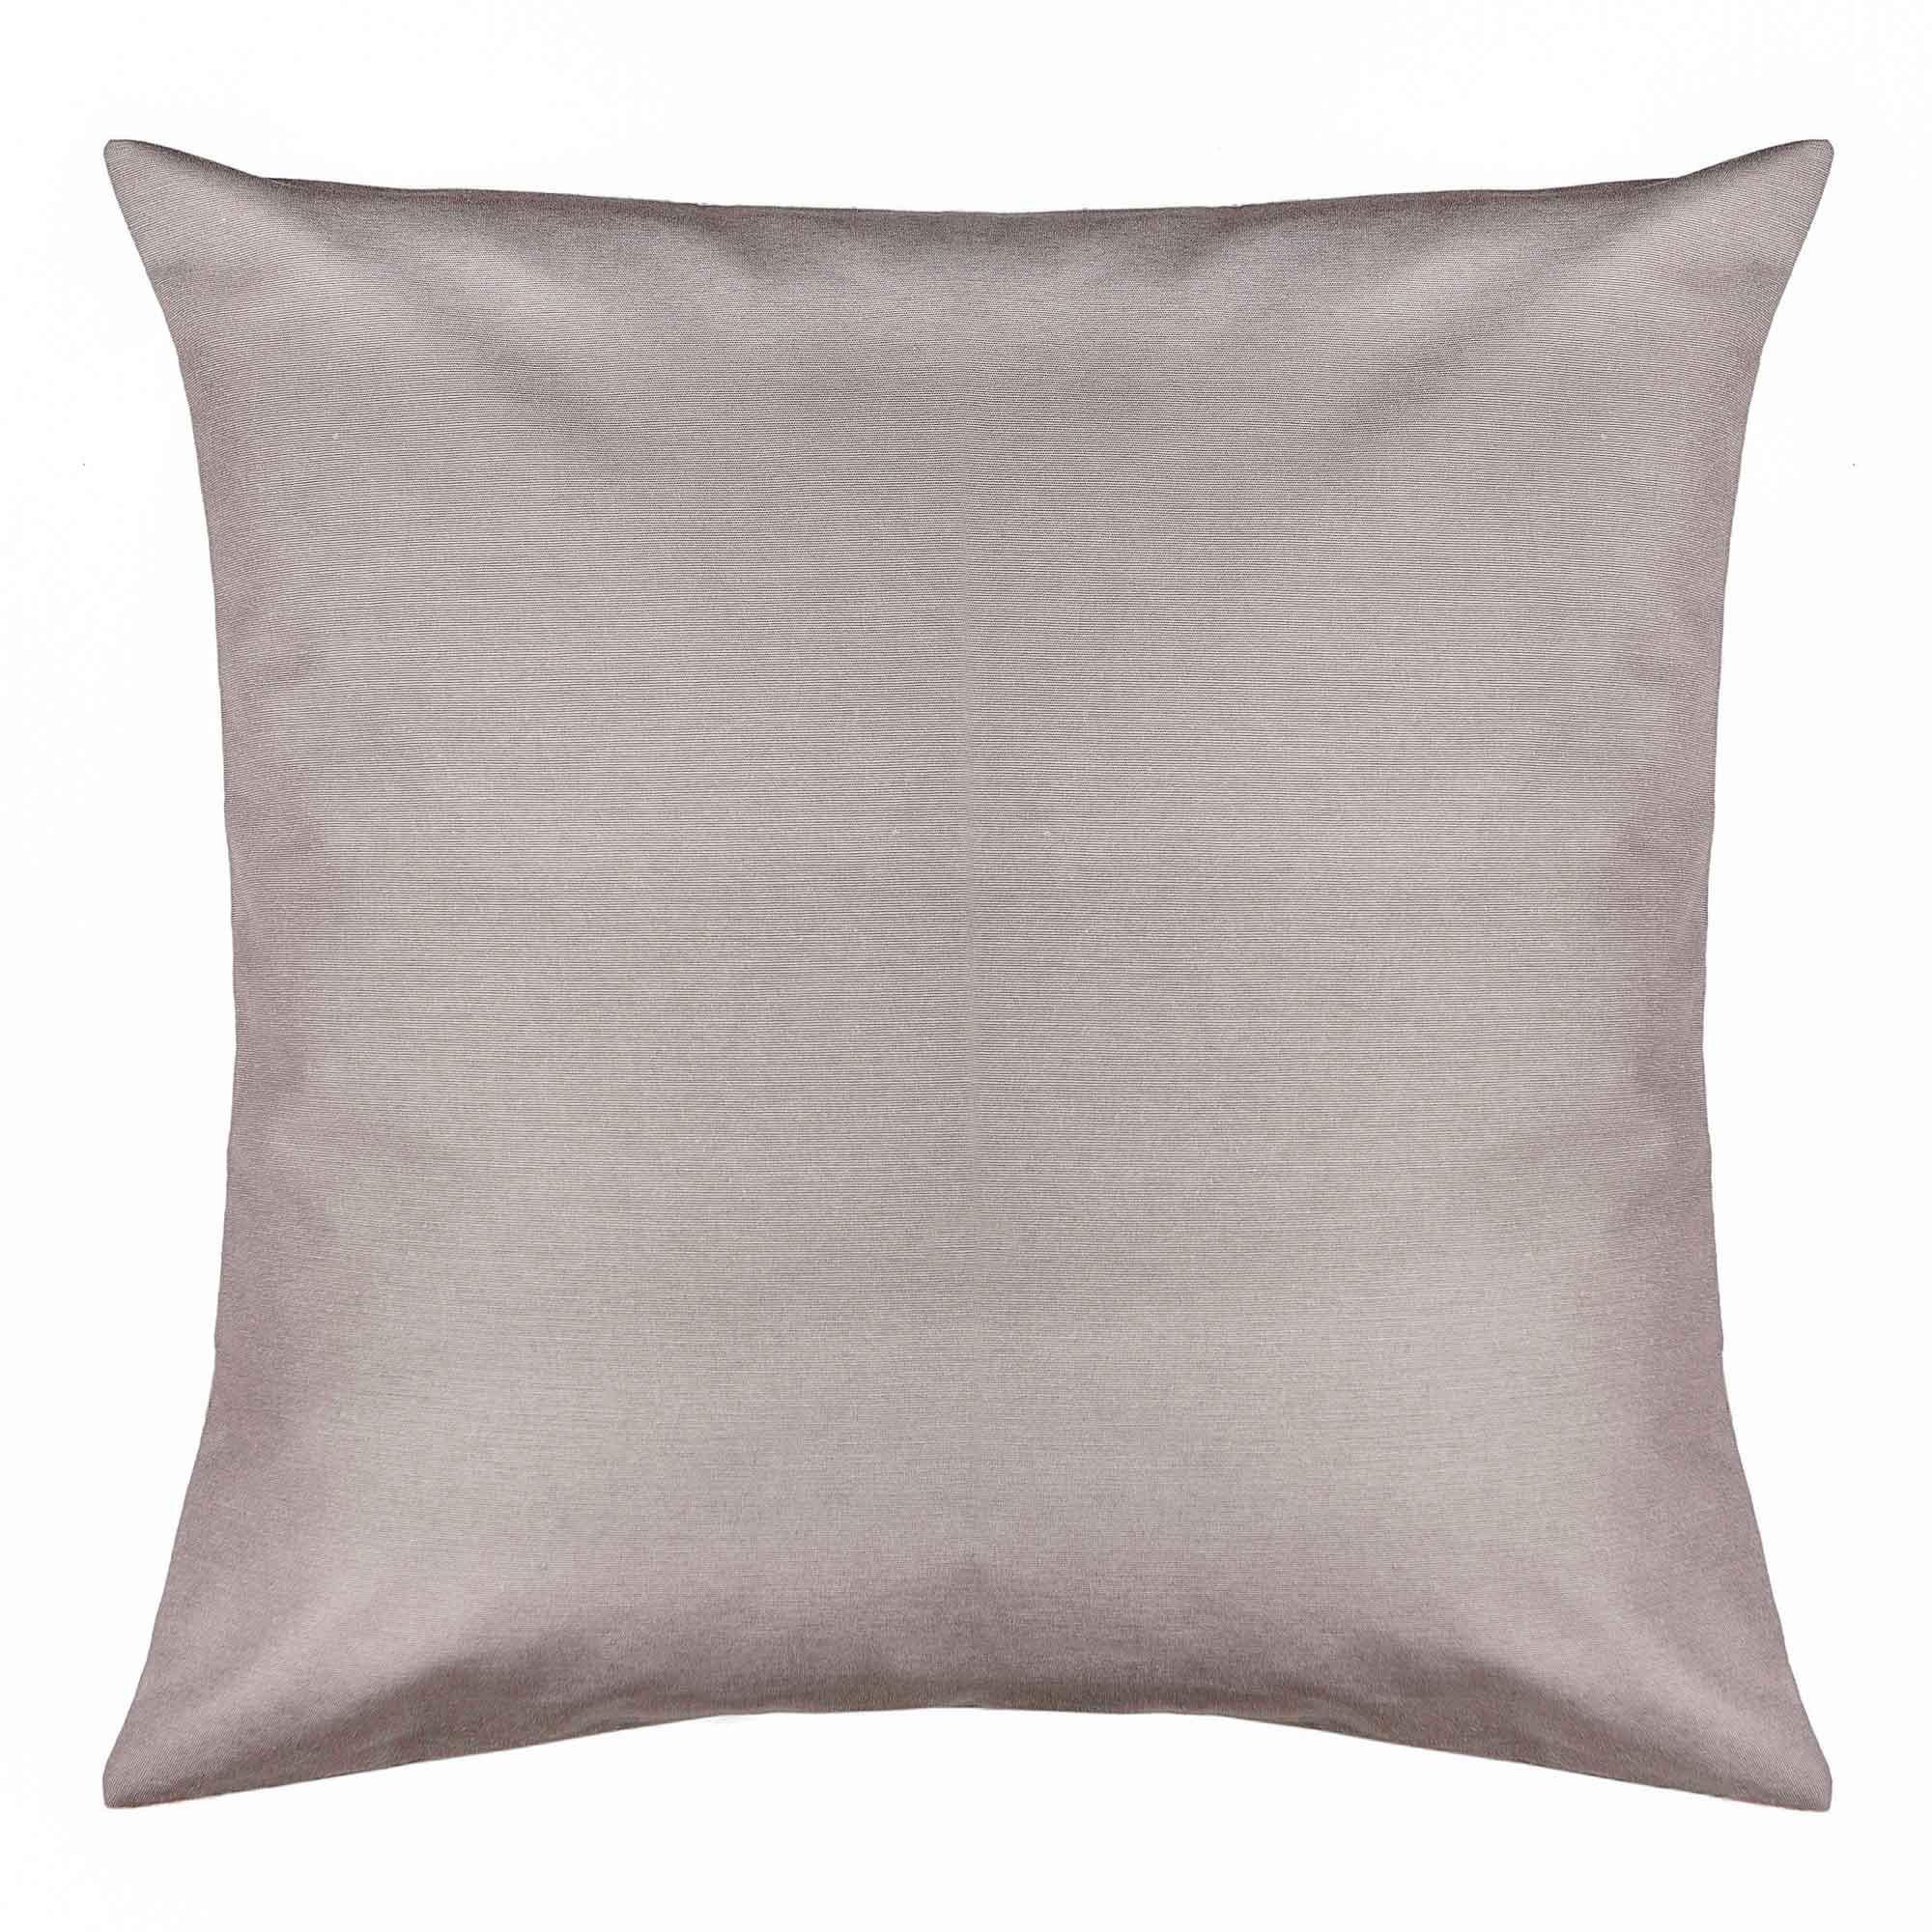 Capa para almofada santista madri 45cm x 45cm 81% algodao 19% poliester cinza